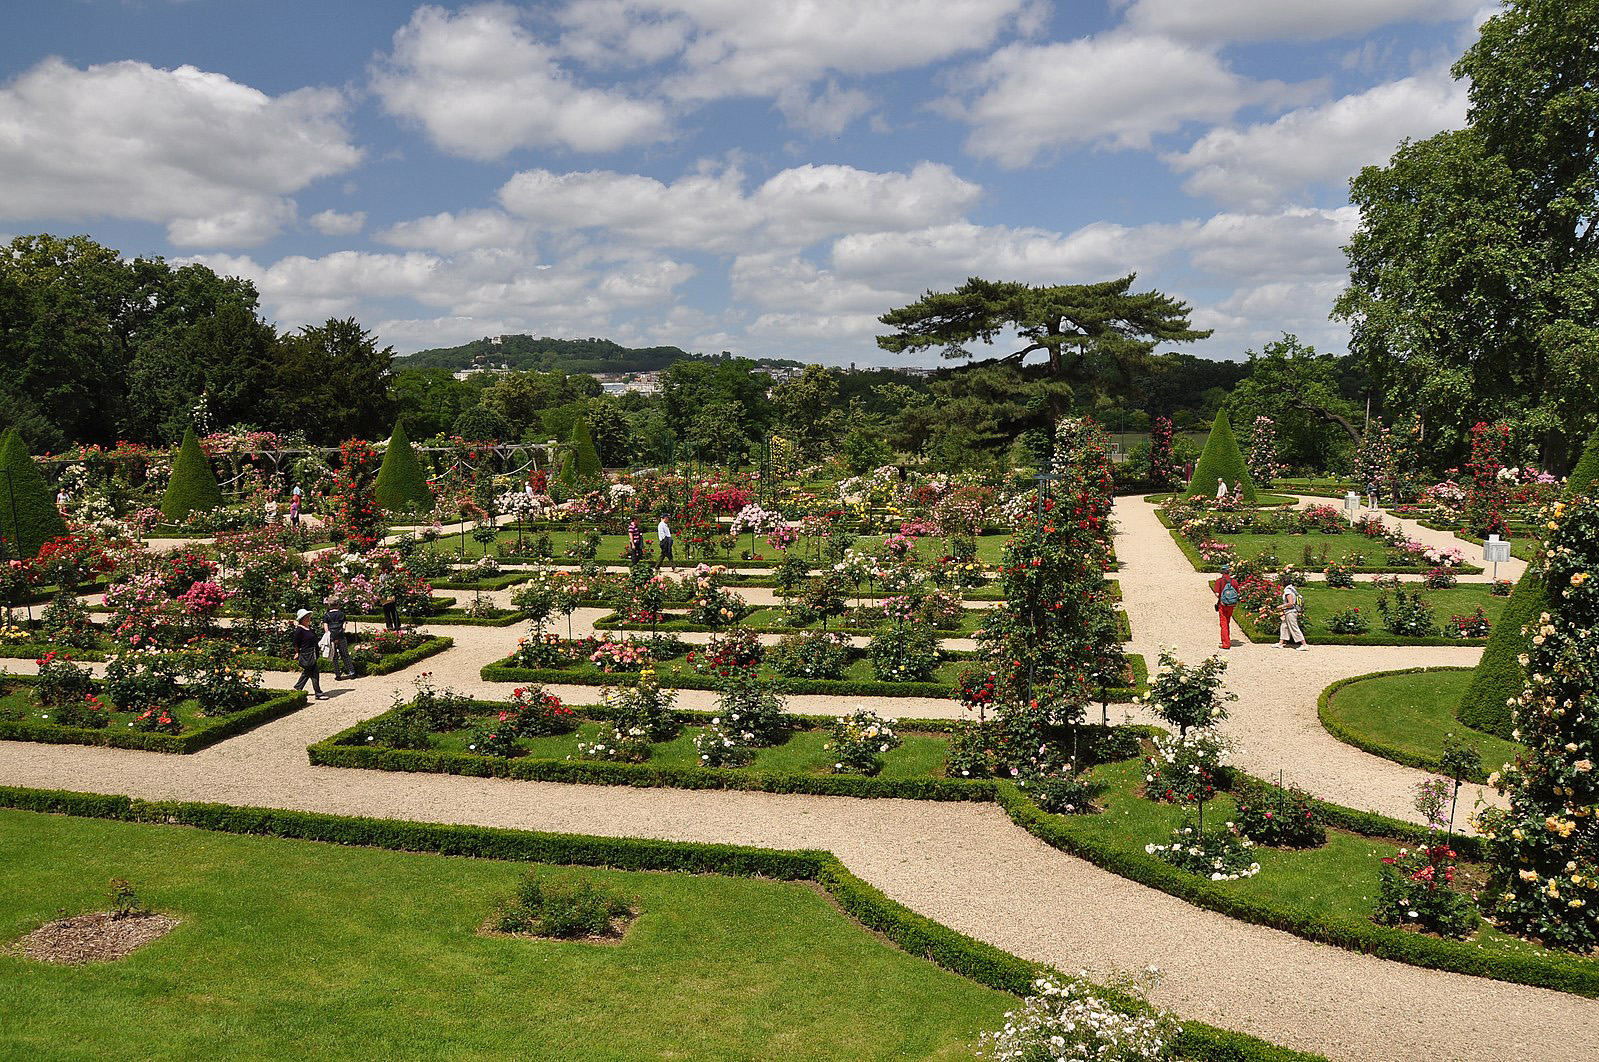 The Rose Garden of Bagatelle, ParisPhoto by Moonik